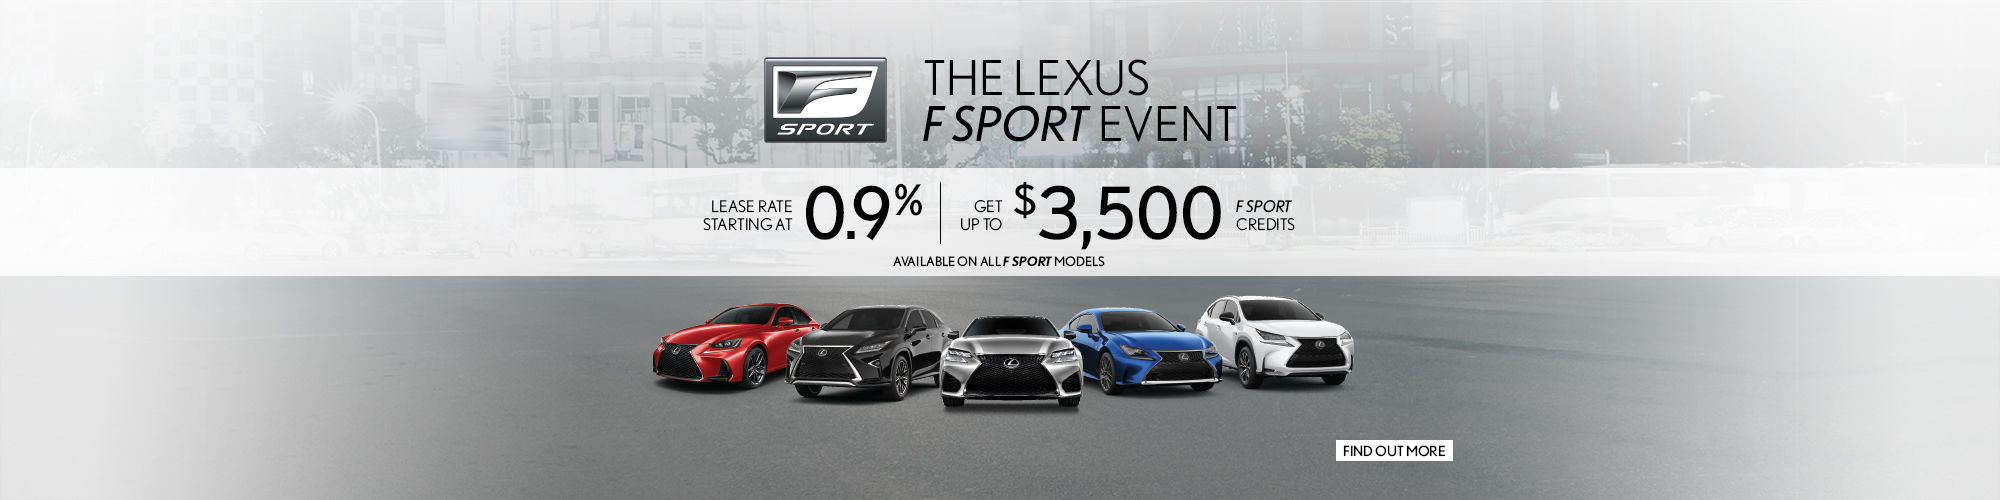 FSport Event